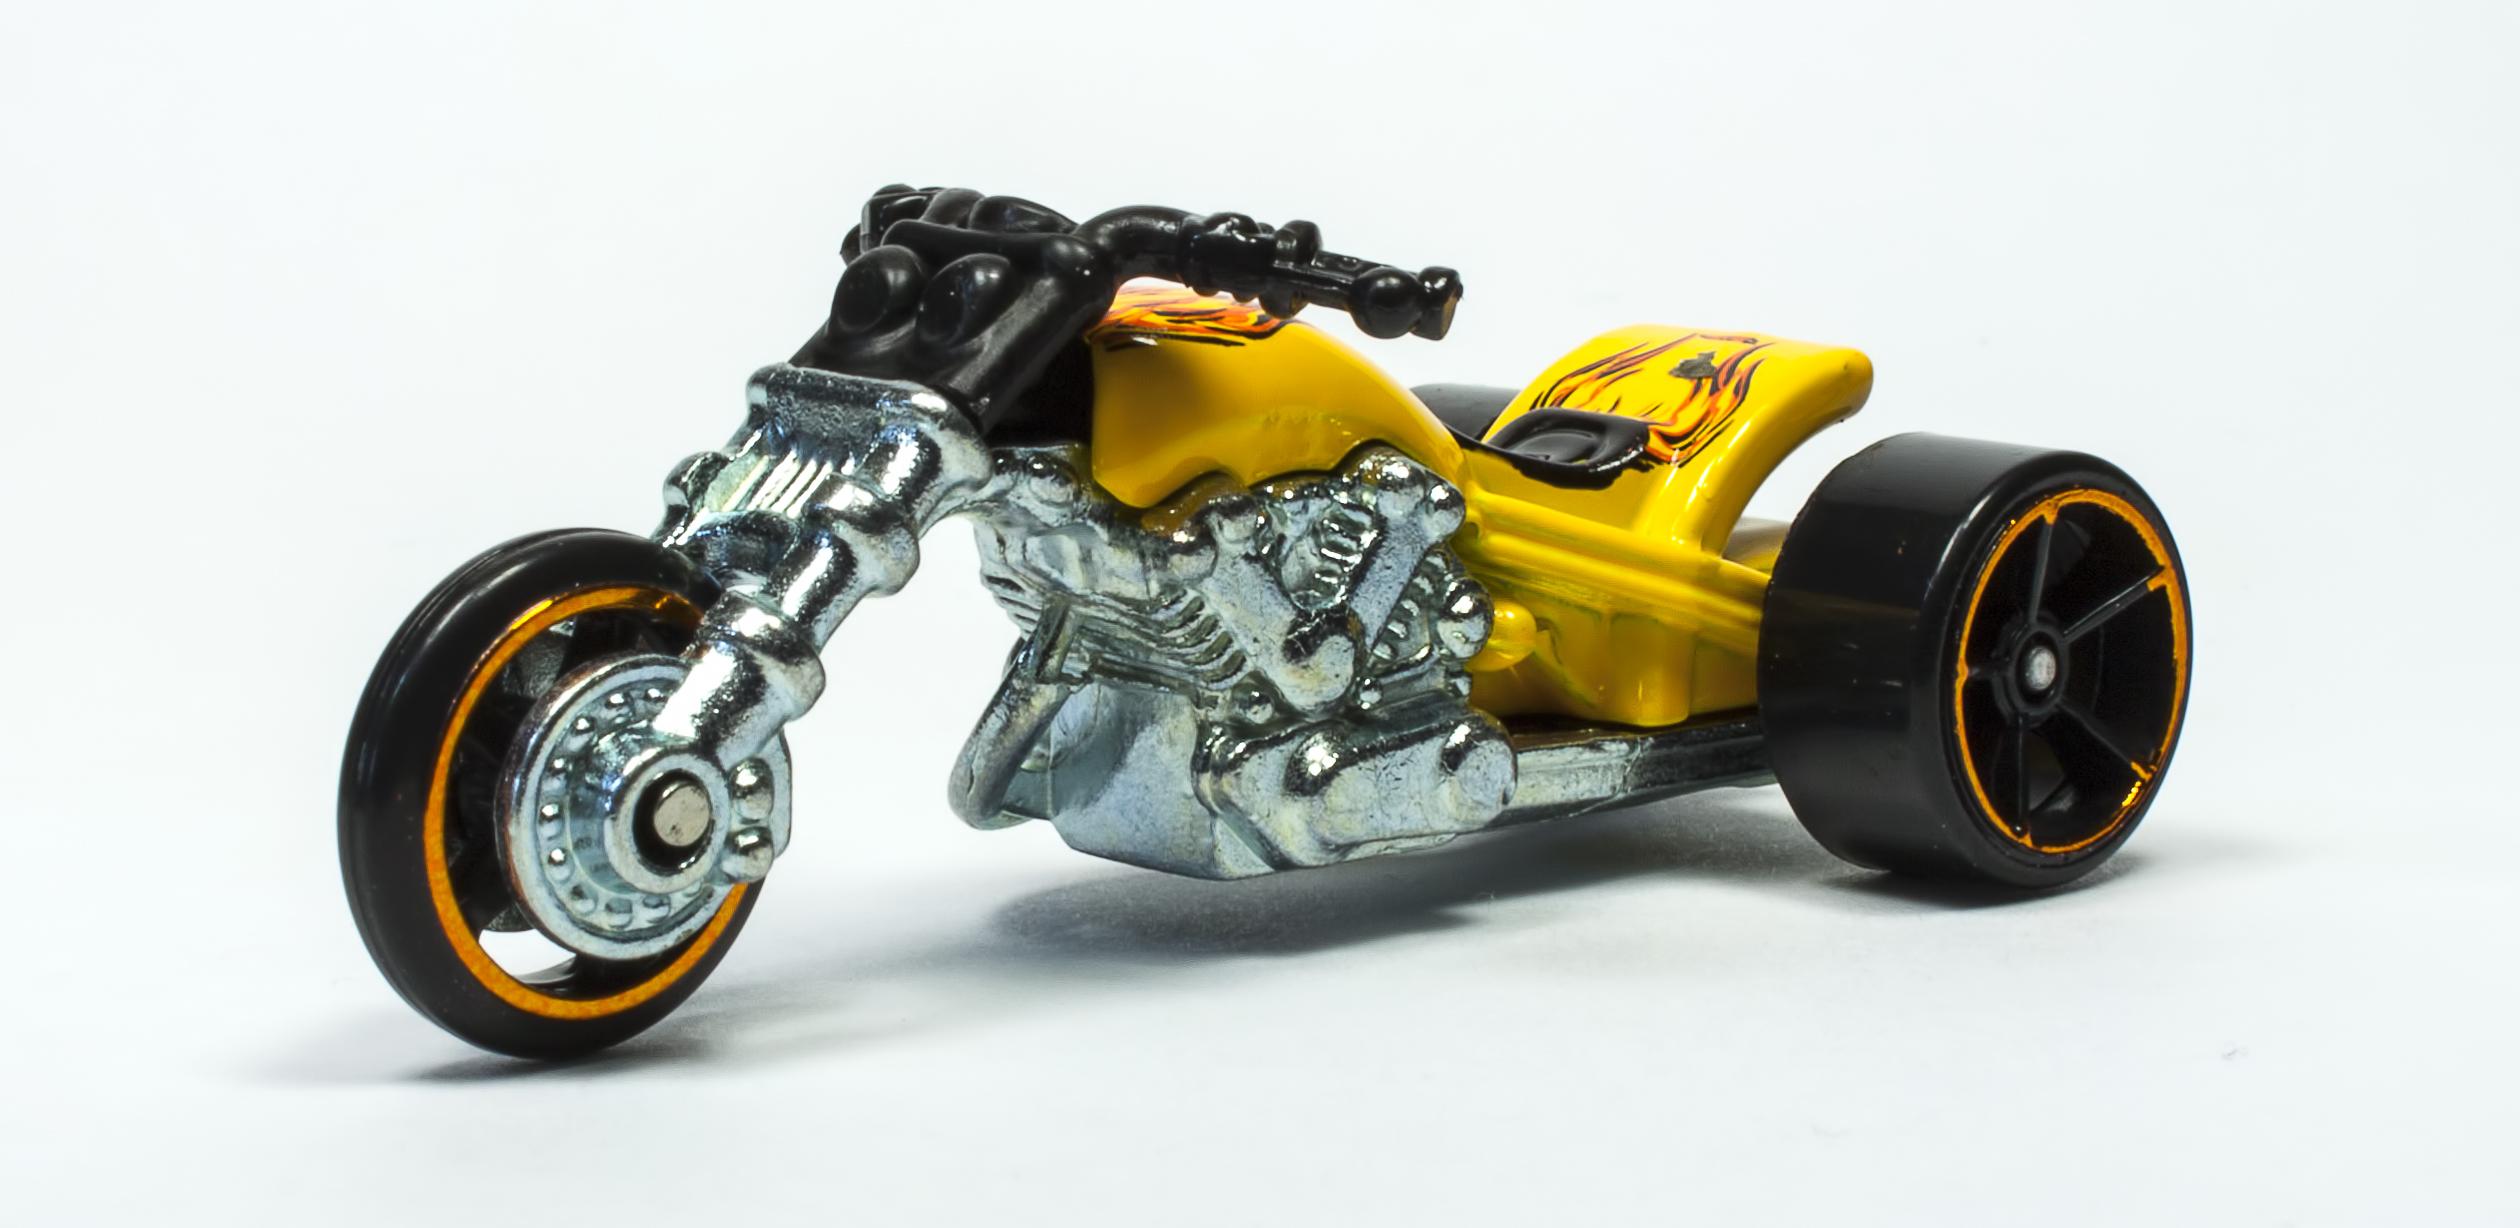 Blastous Moto